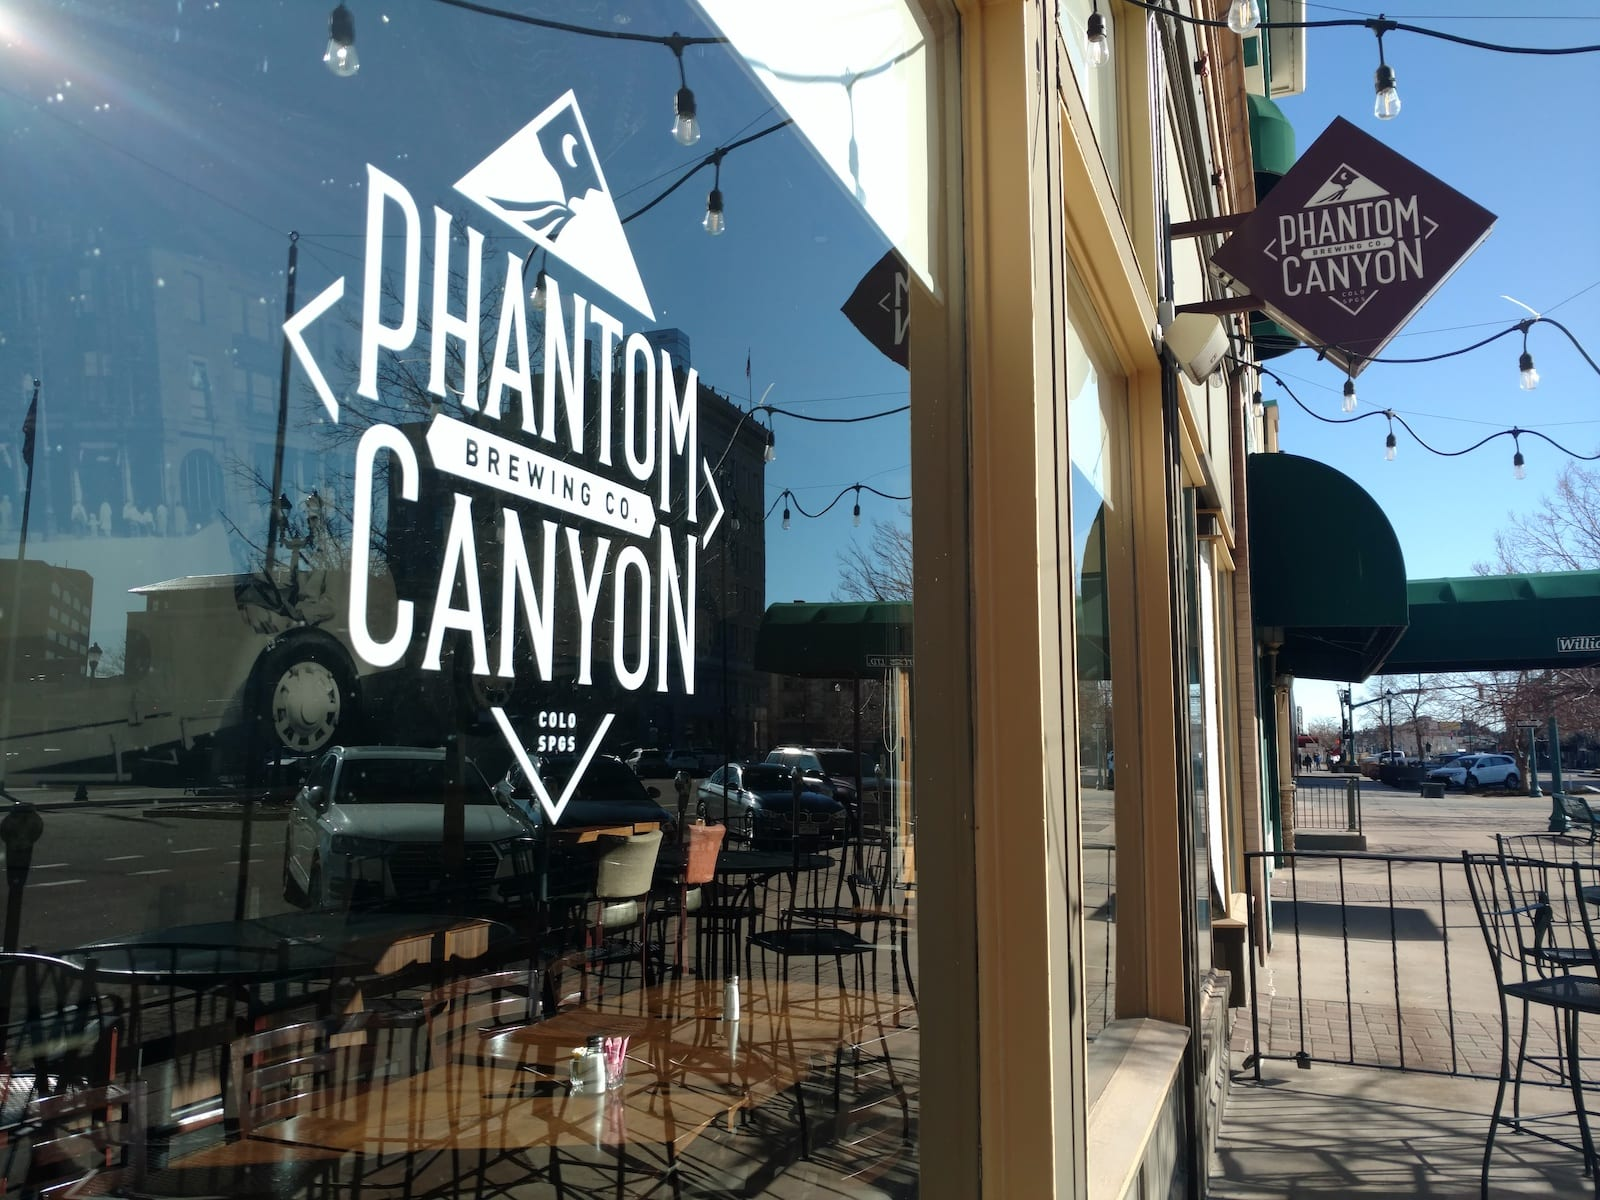 Perusahaan Pembuatan Bir Phantom Canyon Colorado Springs